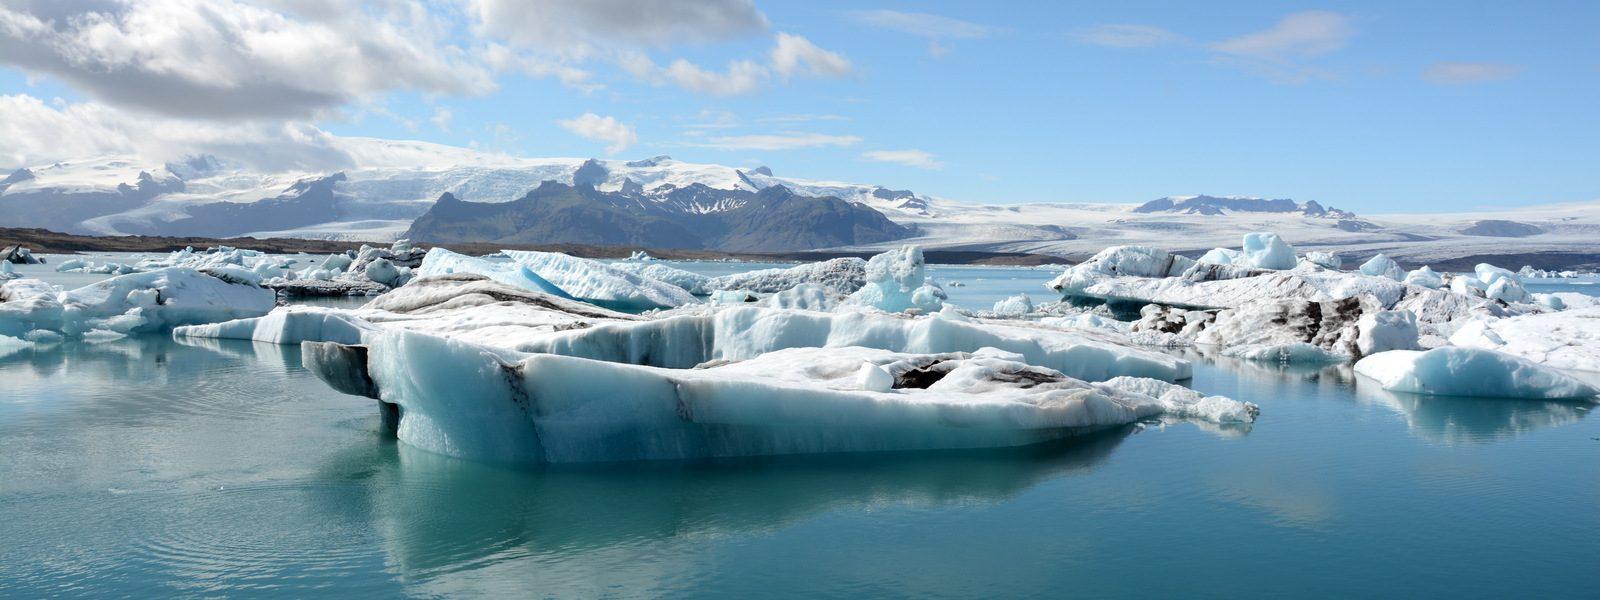 Wild Iceland with mystic Scotland